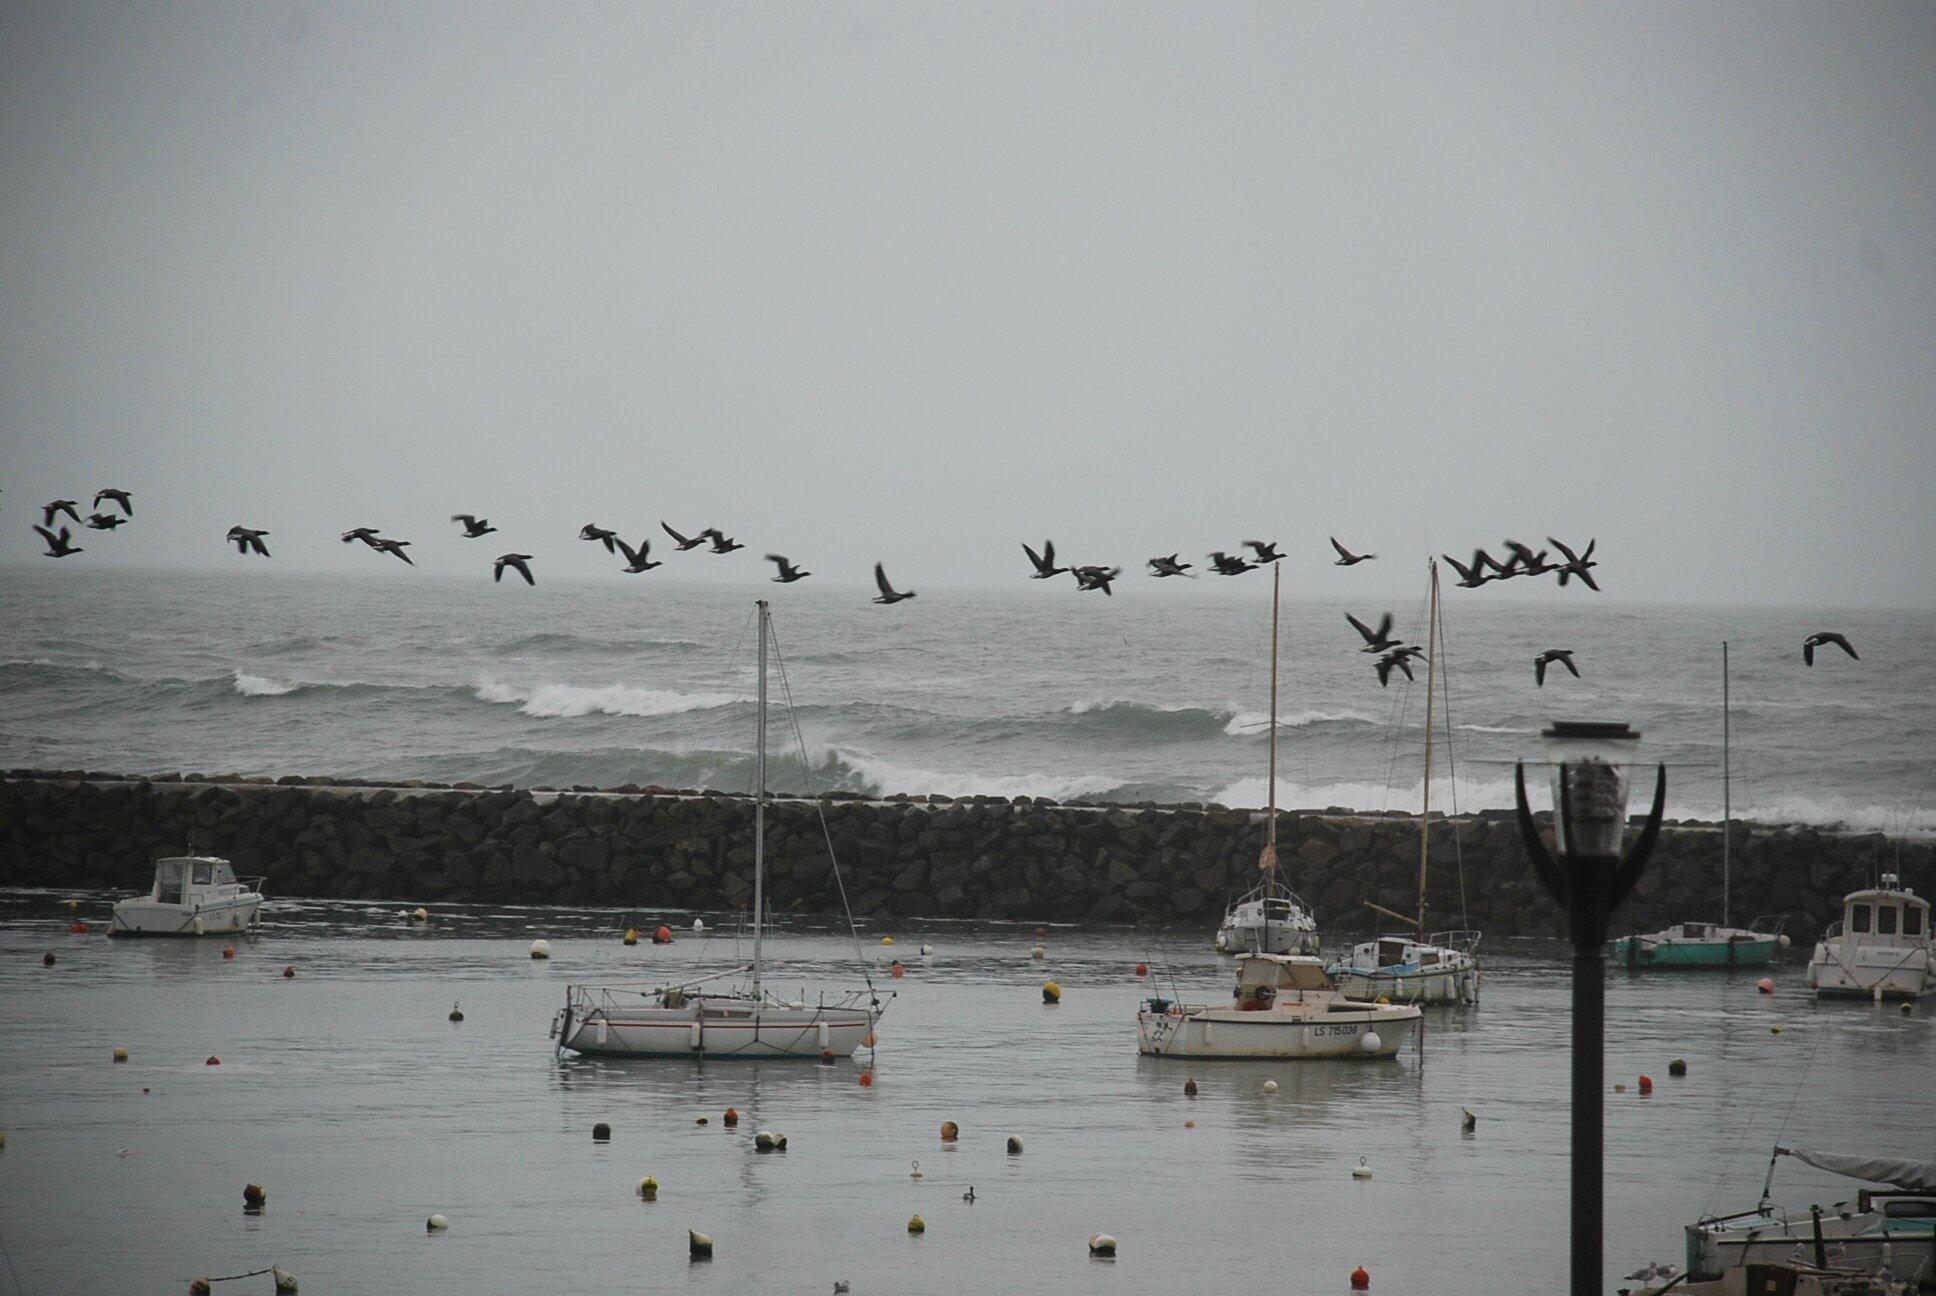 Vendée, Jard sur mer